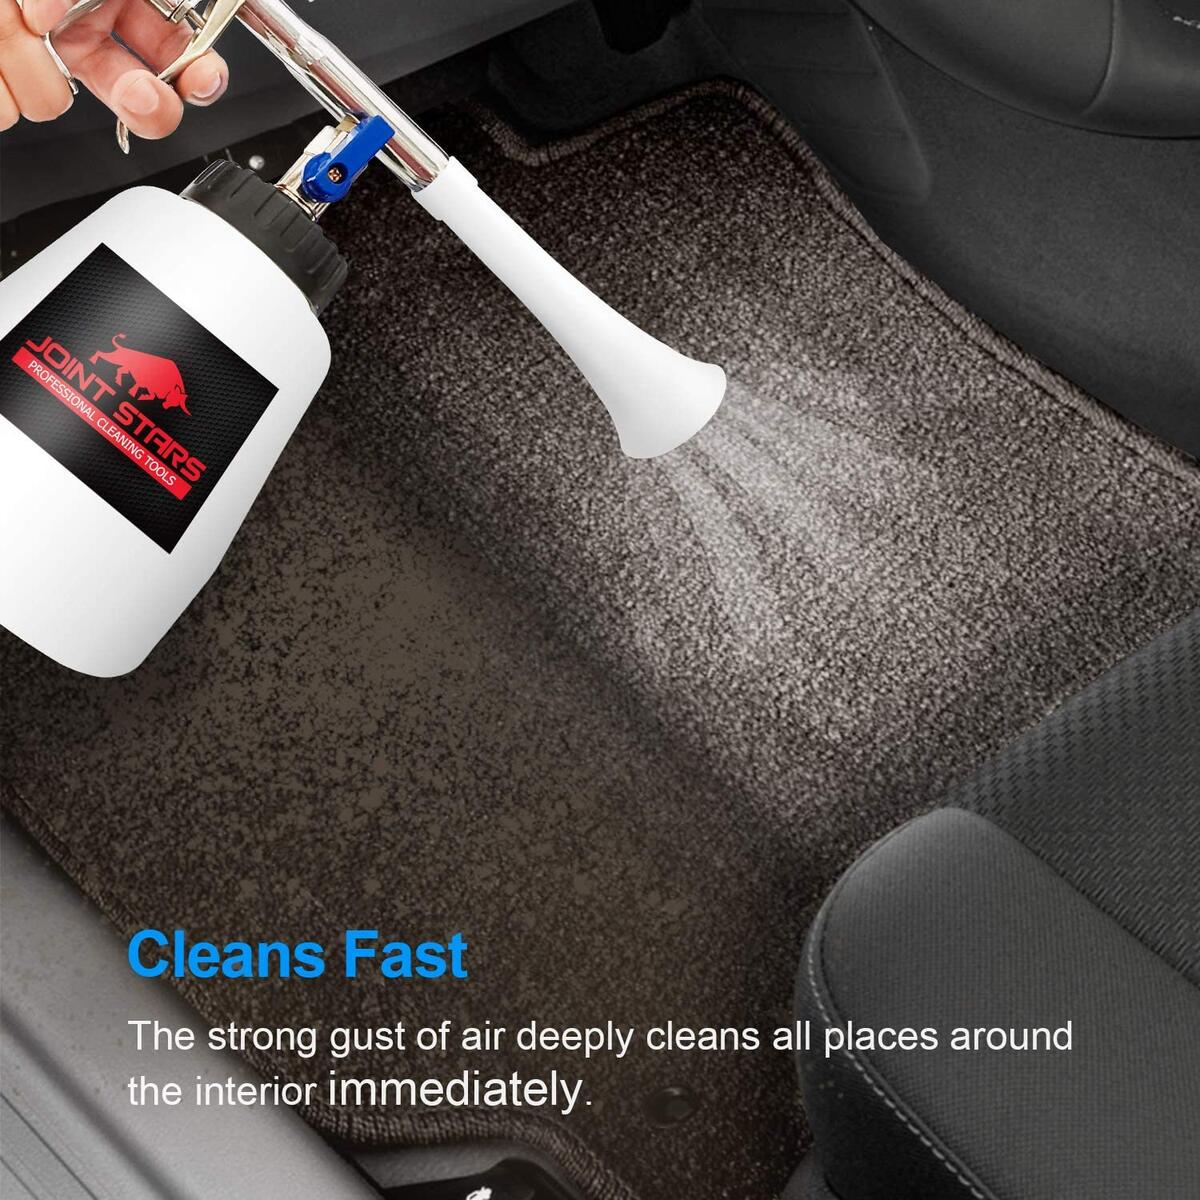 JOINT STARS High Pressure Car Cleaning Gun Jet Cleaner High Pressure Cleaner Car Interior Detailing Kit High Pressure Car Cleaning Tool for Detailing Supplies, Silver